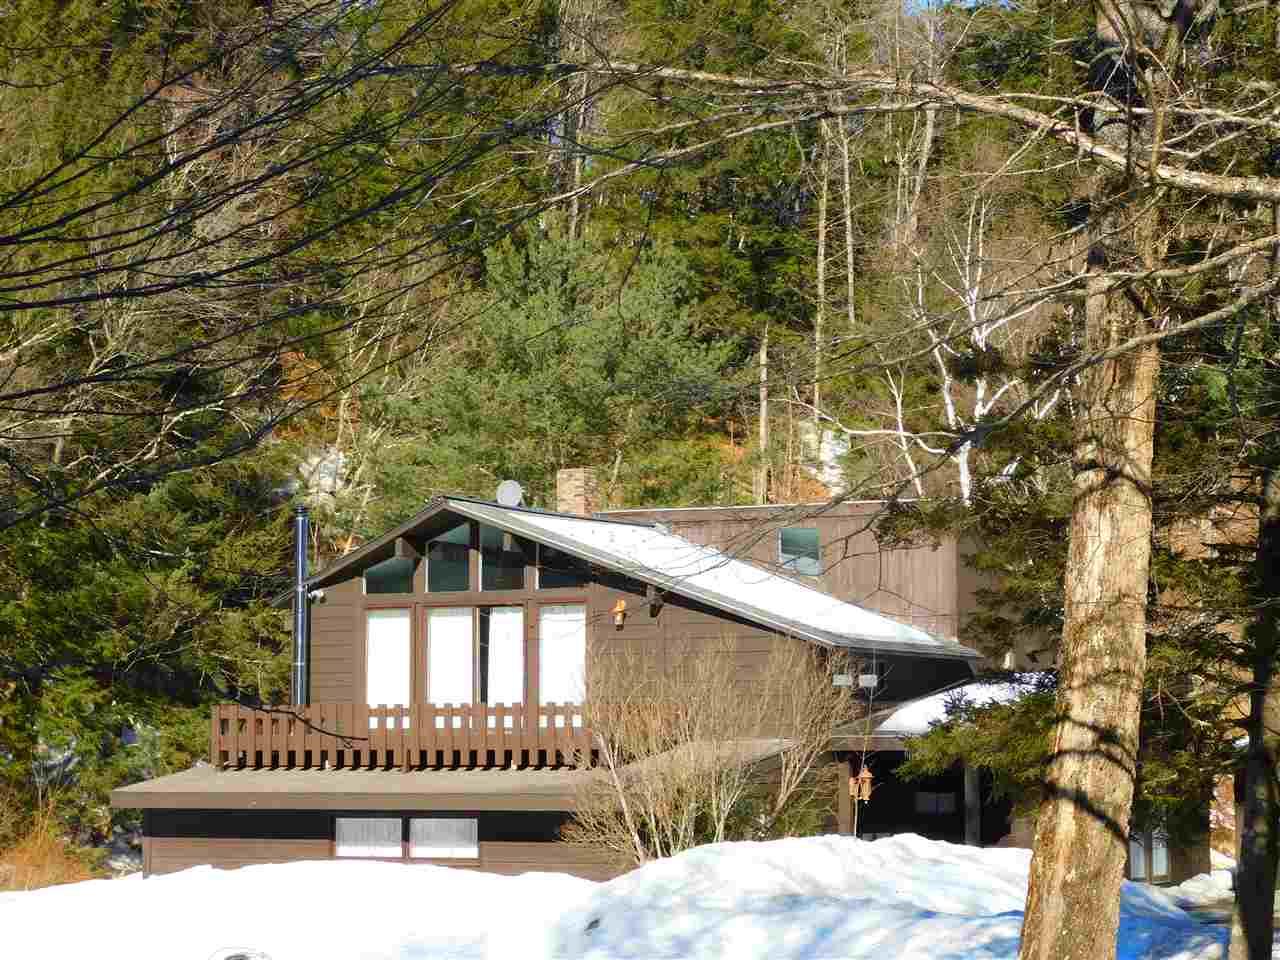 Mount-Snow-Real-Estate-4463107-1